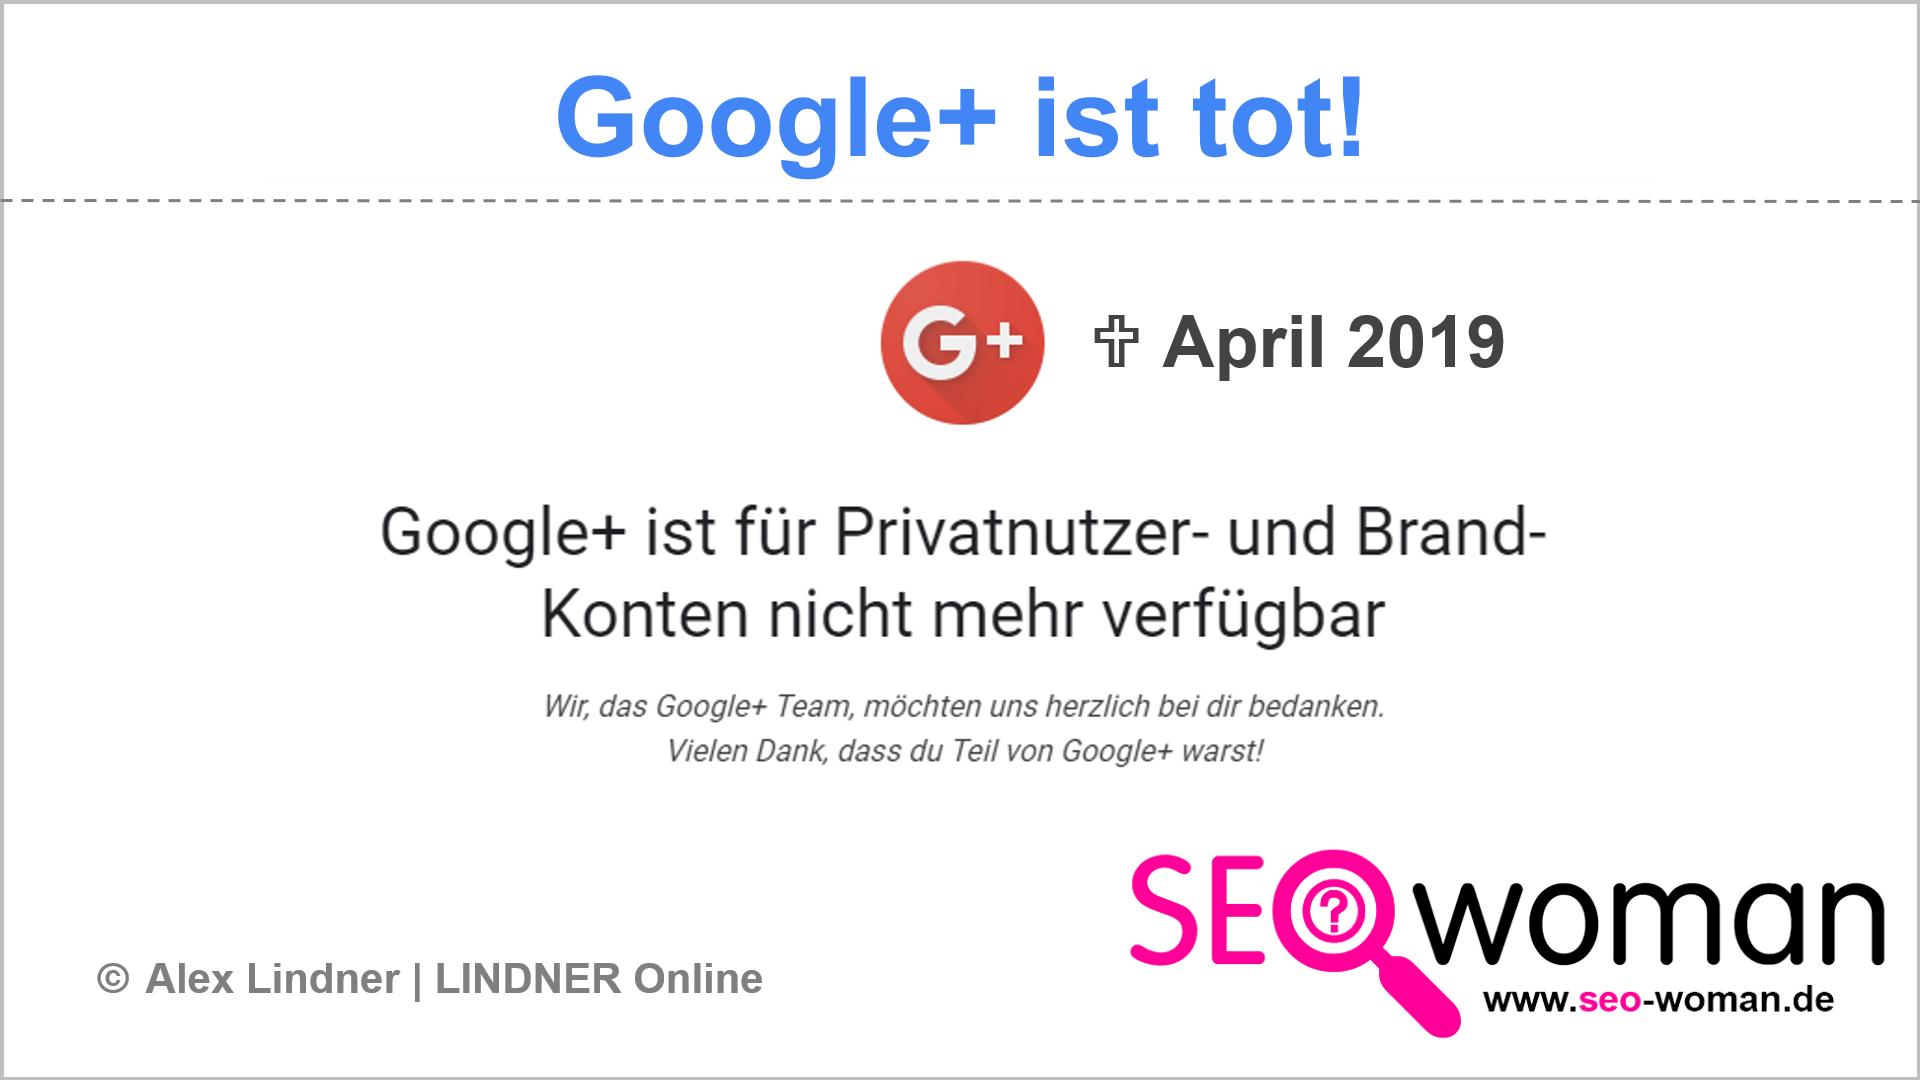 Google+ - gestorben im April 2019 - R.I.P.